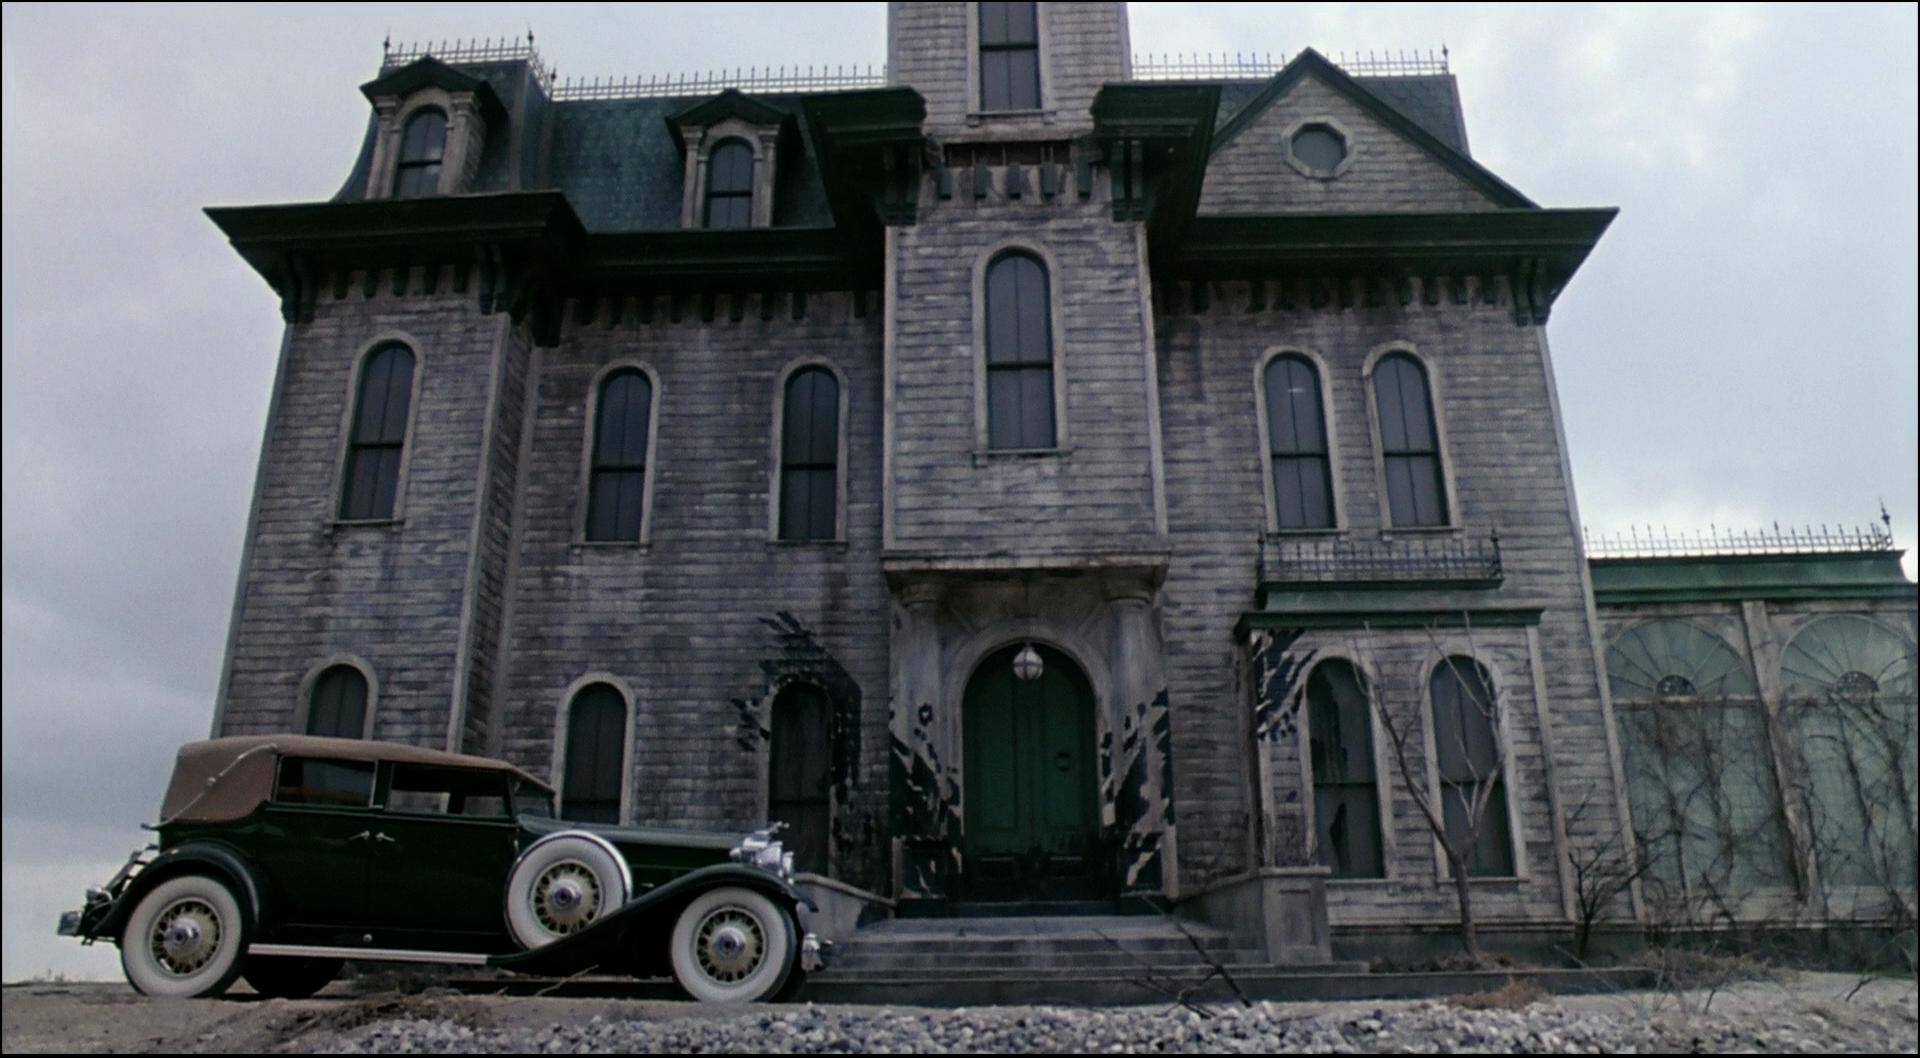 Addams Family 1991 Movie Mansion Inspiration Addams